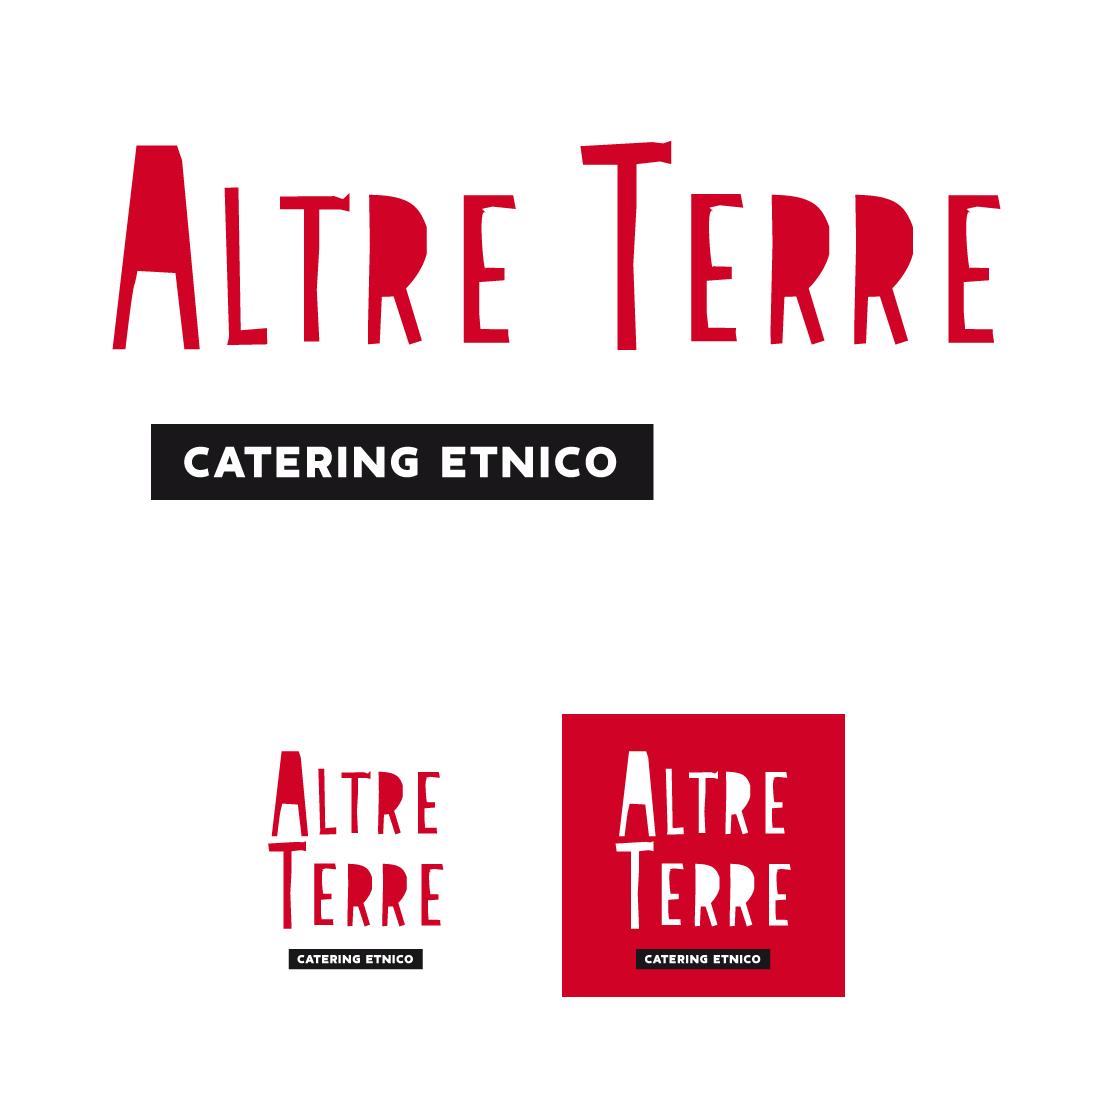 Altre-Terre-catering-logo